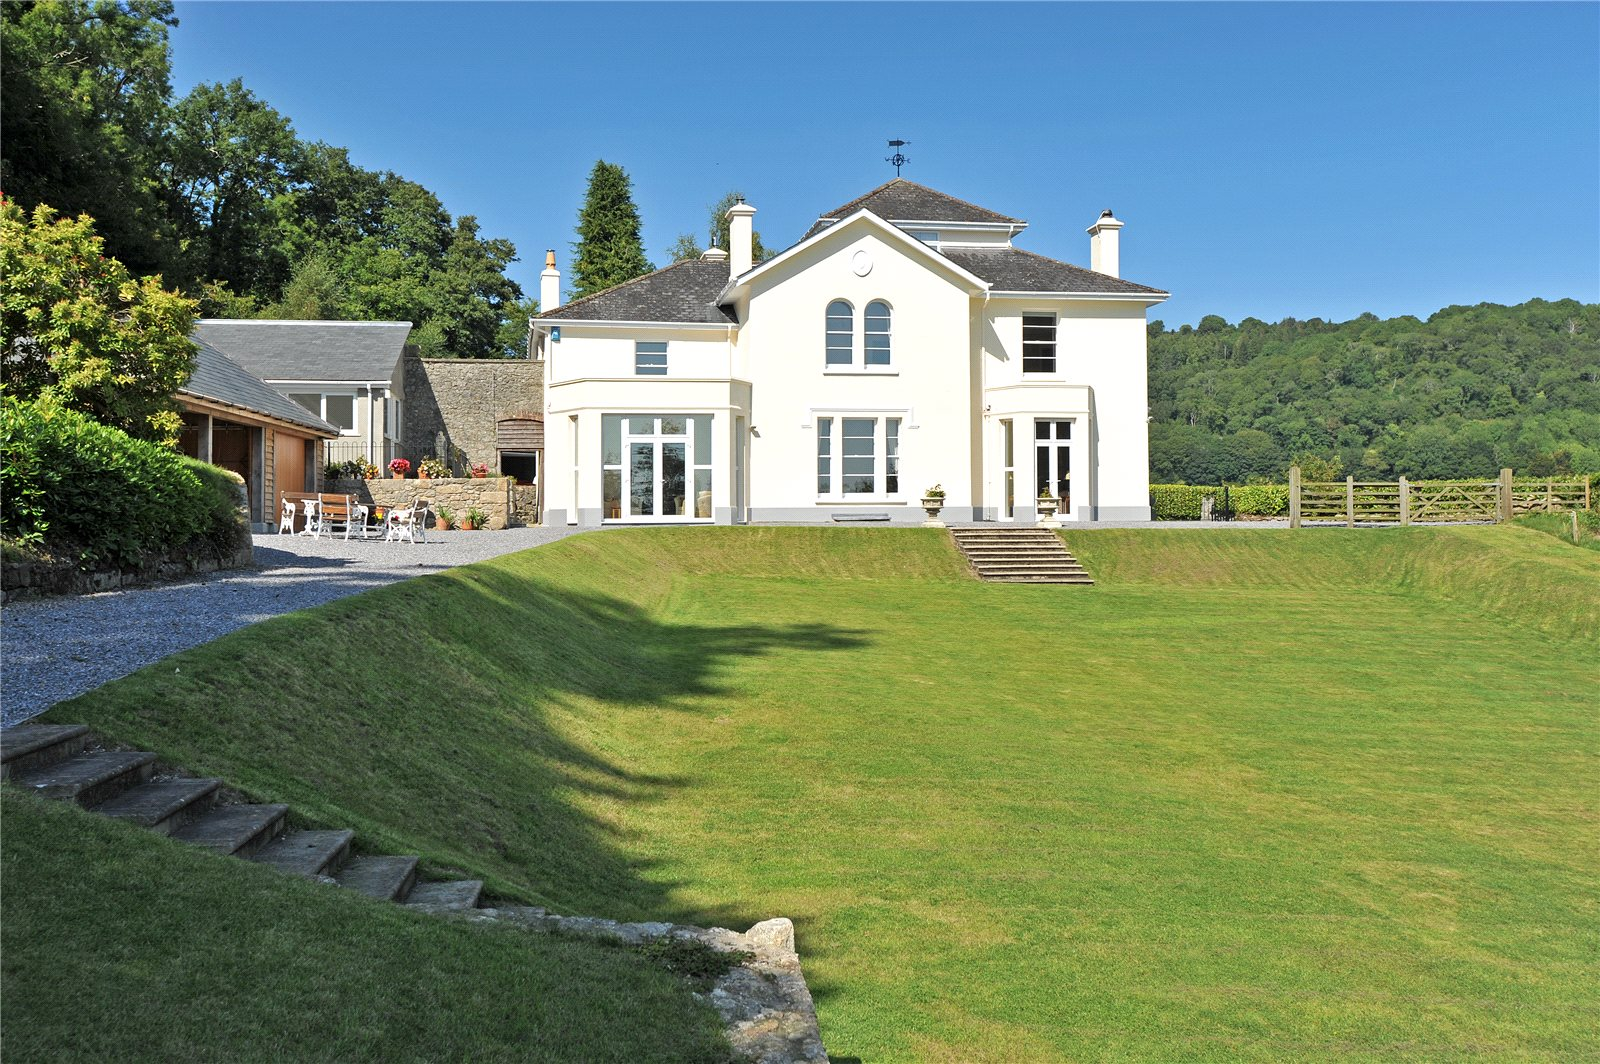 Single Family Home for Sale at Lustleigh, Newton Abbot, Devon, TQ13 Newton Abbot, England